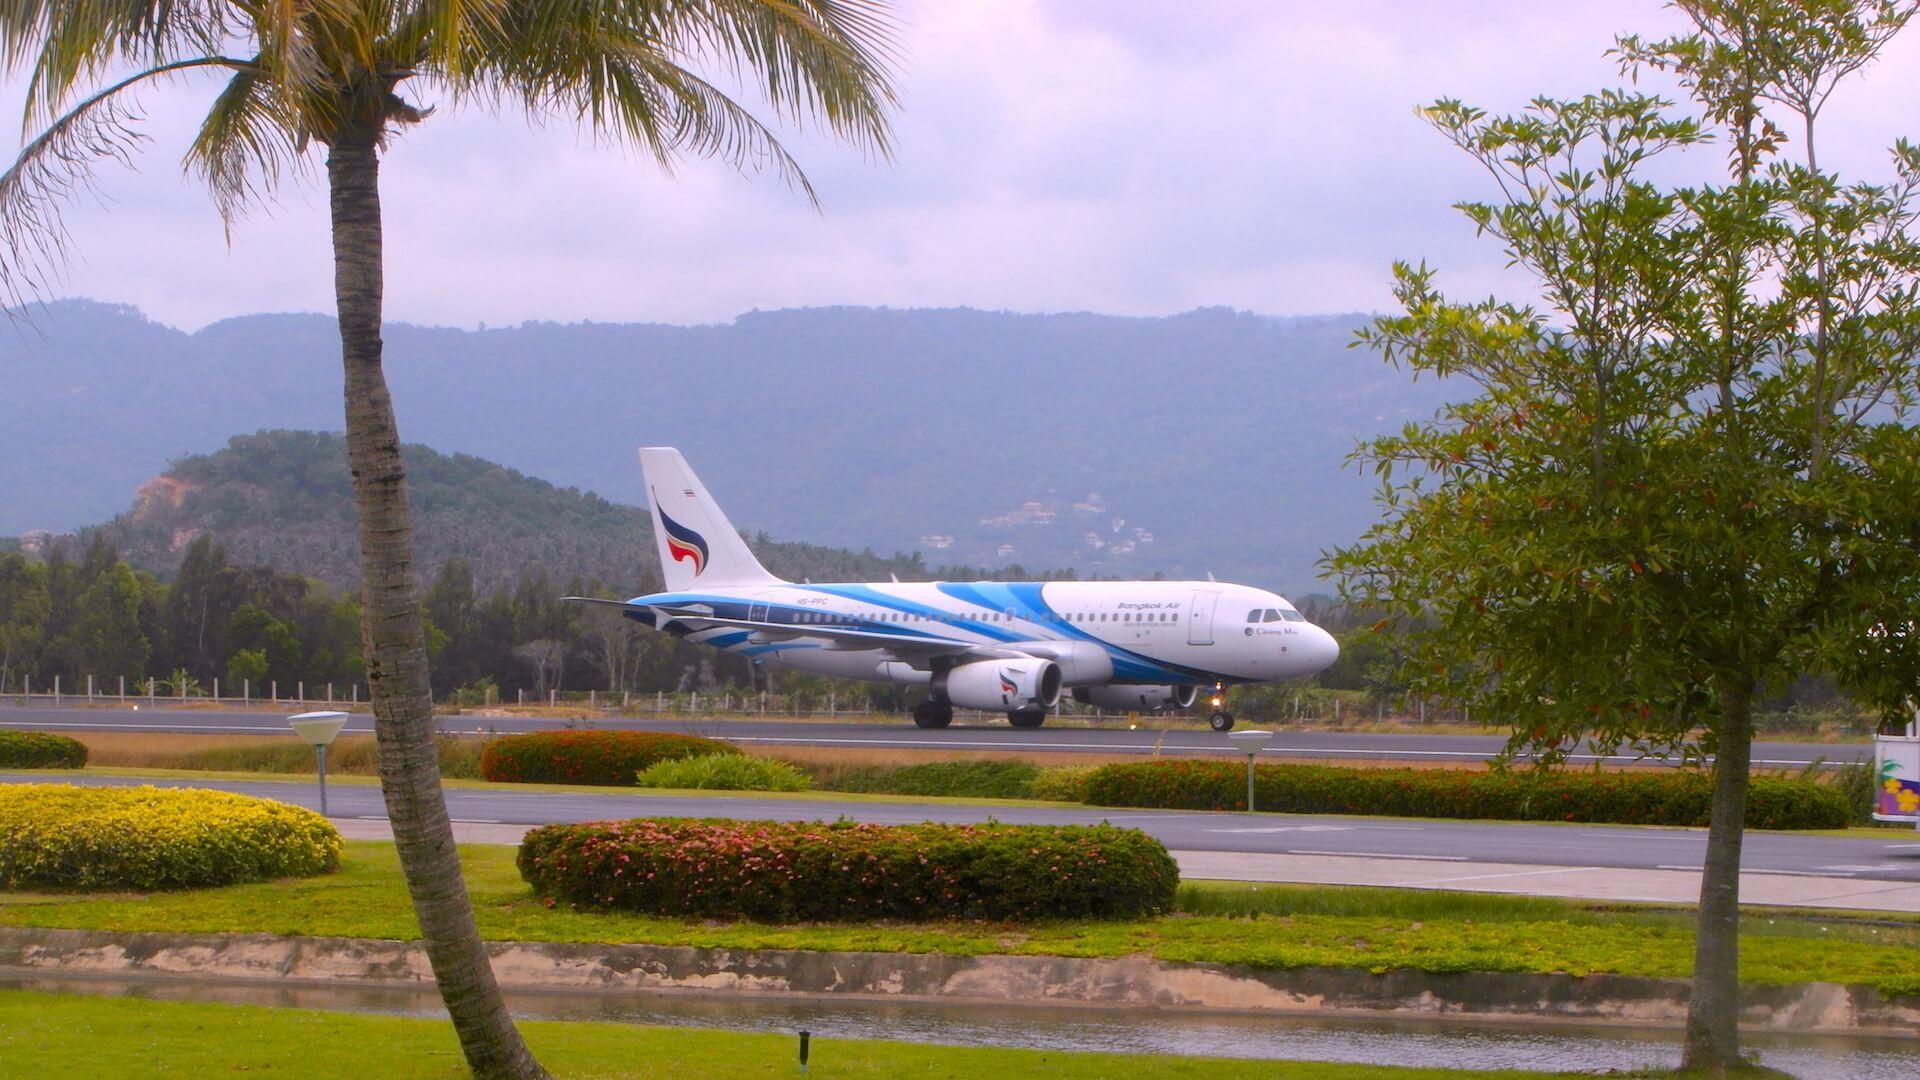 Koh Samui Airport Bangkok Airways A319